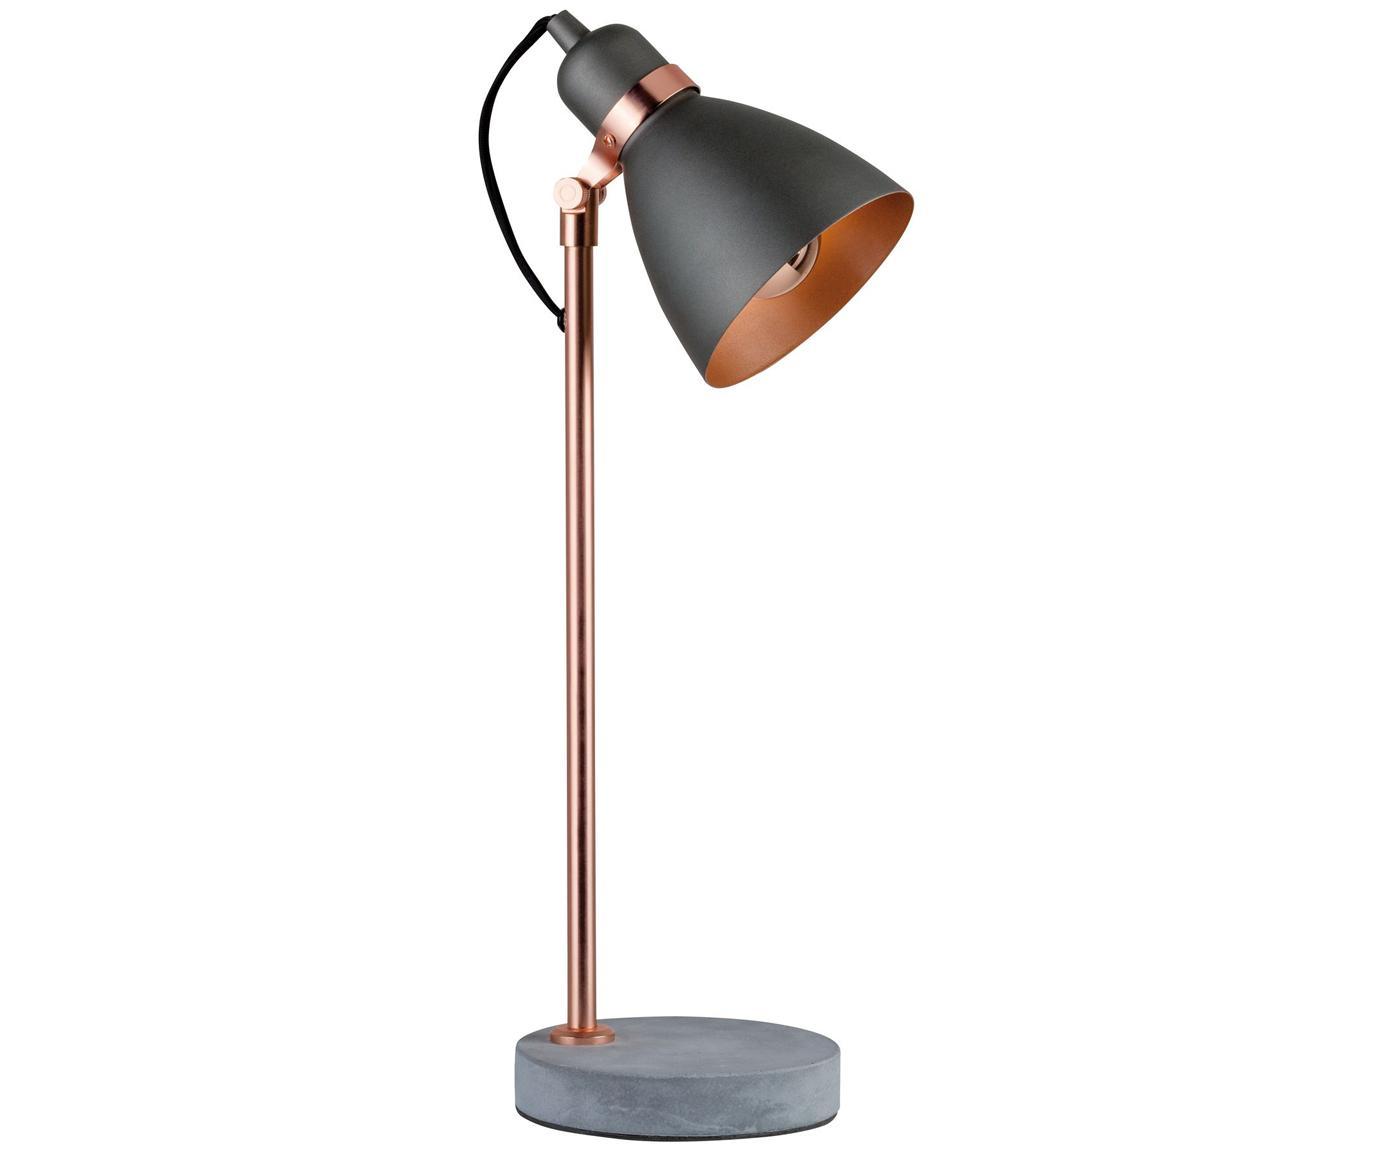 Tafellamp Orm, Lampvoet: betonkleurig, Koperkleurig, grijs, Ø 15 x H 50 cm